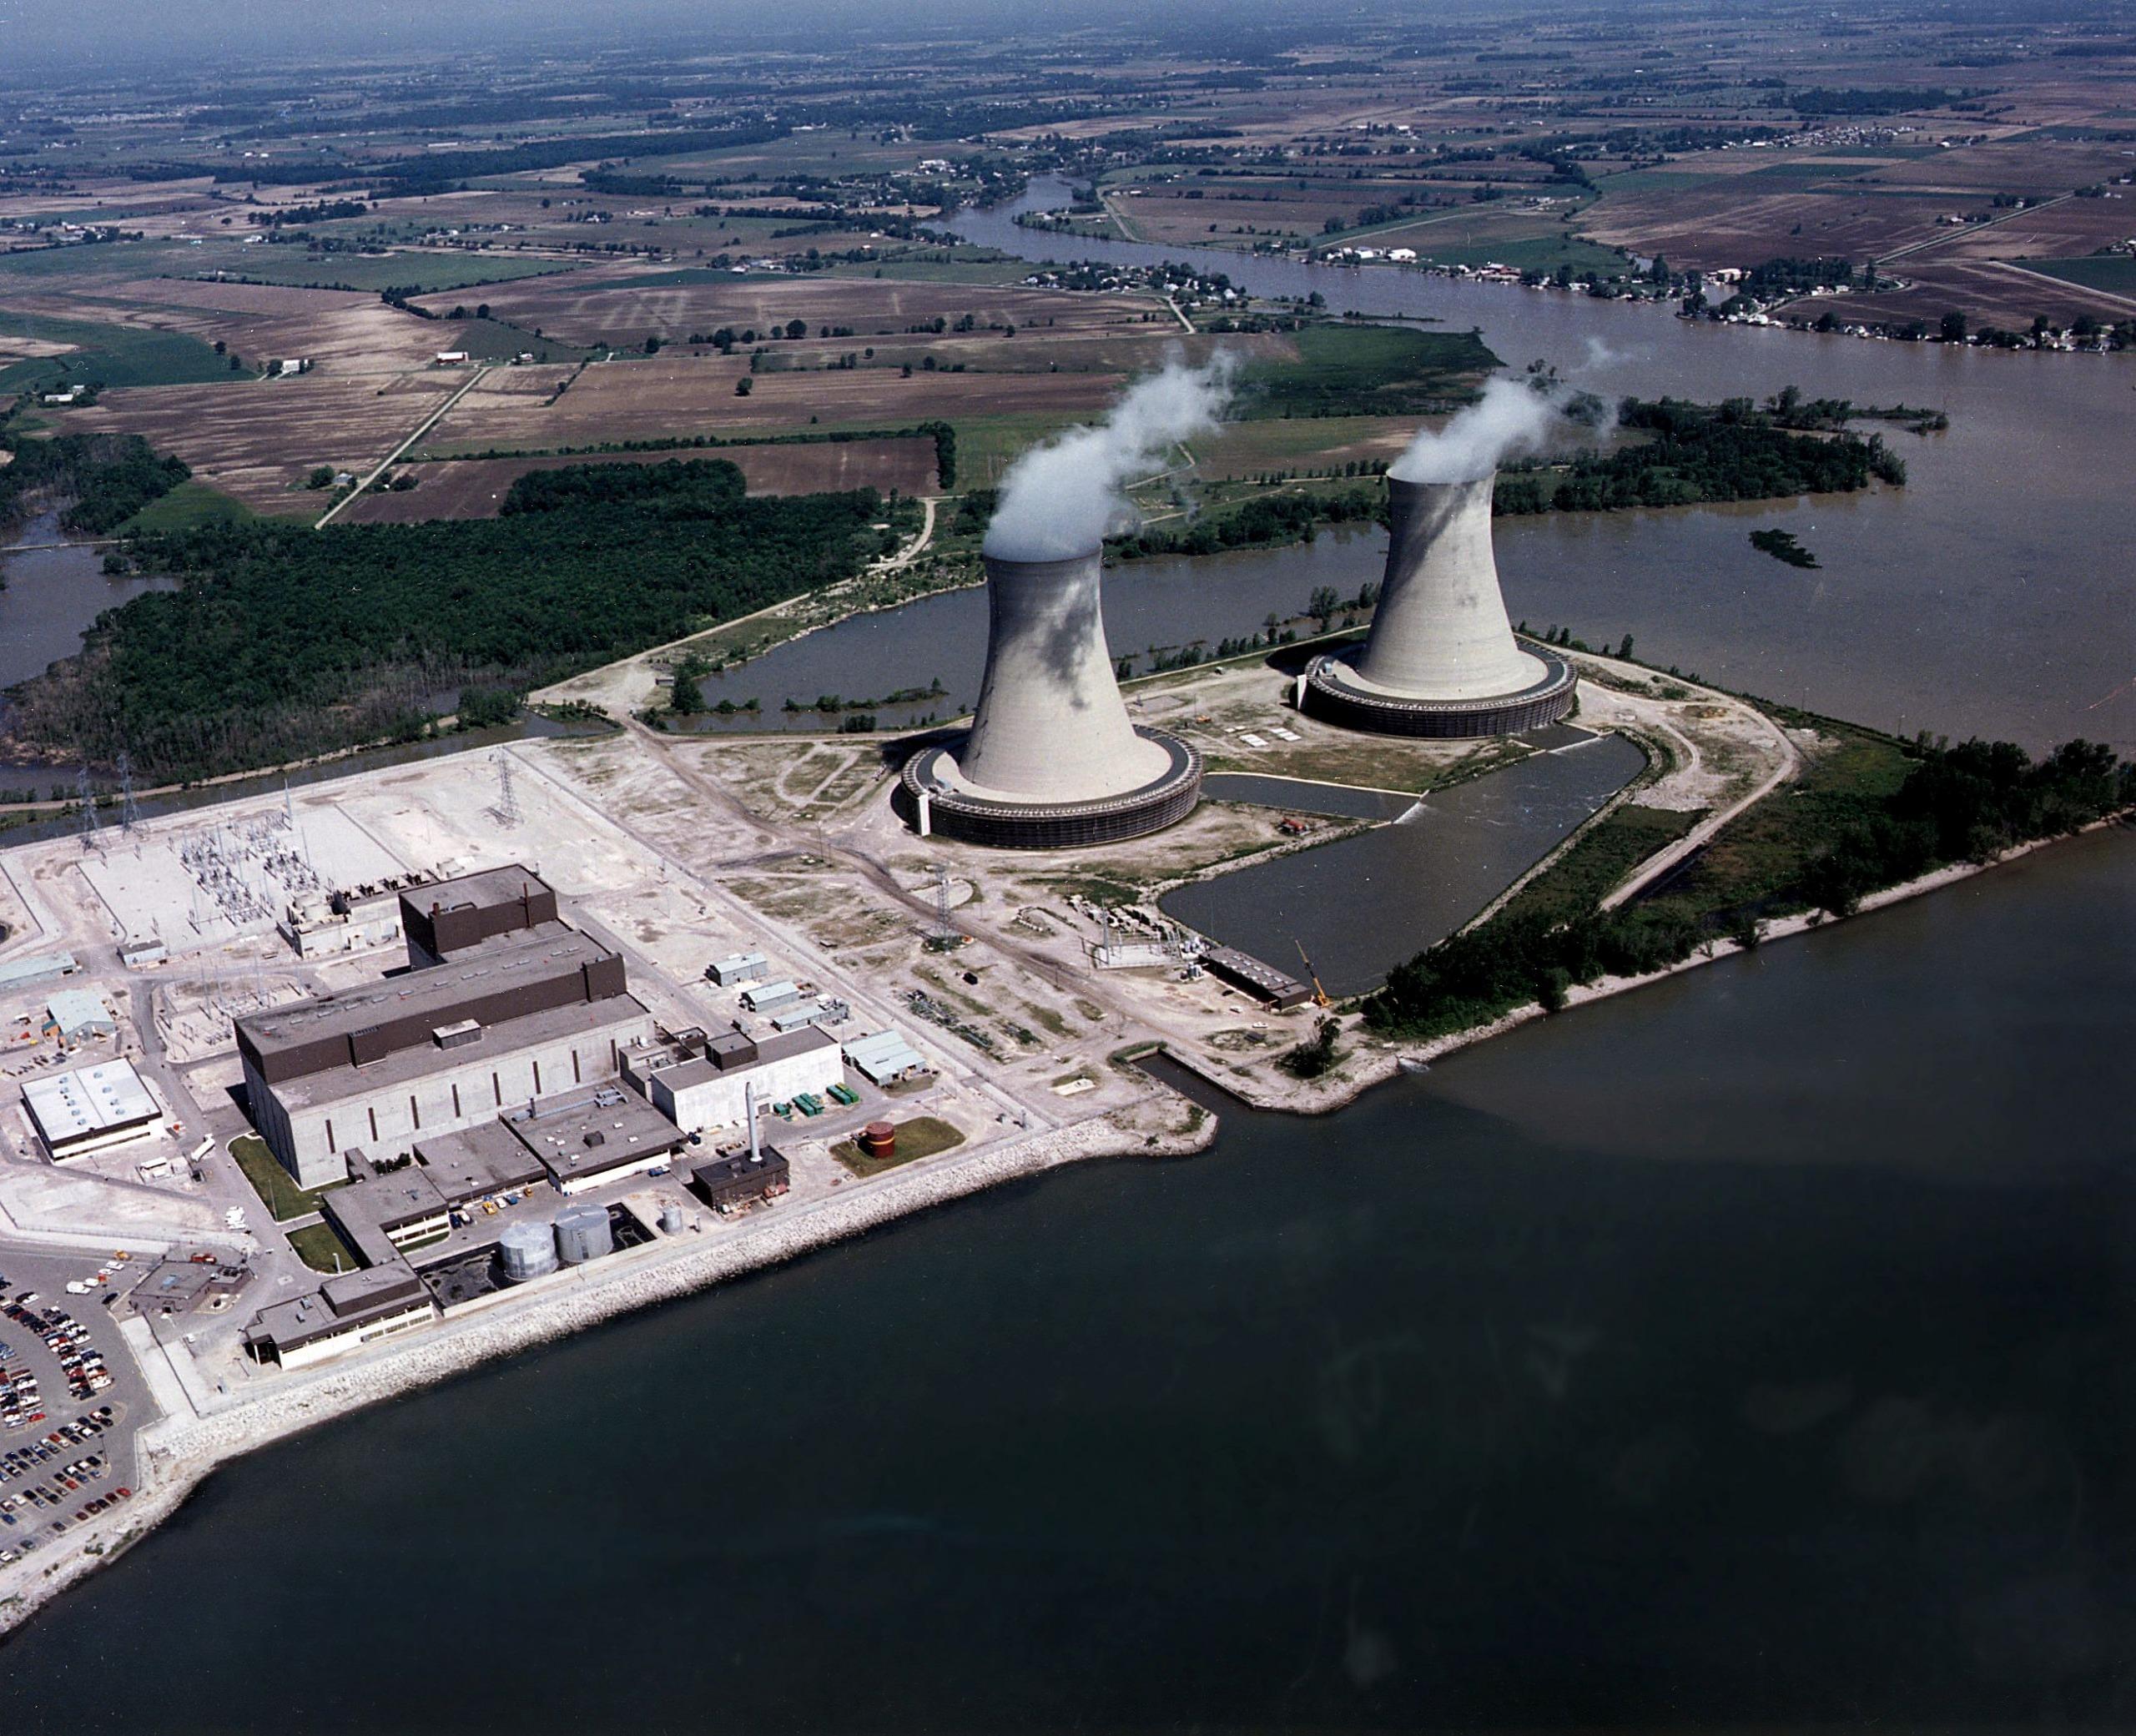 Zunehmende Klimafolgen bedrohen US-Kernreaktoren